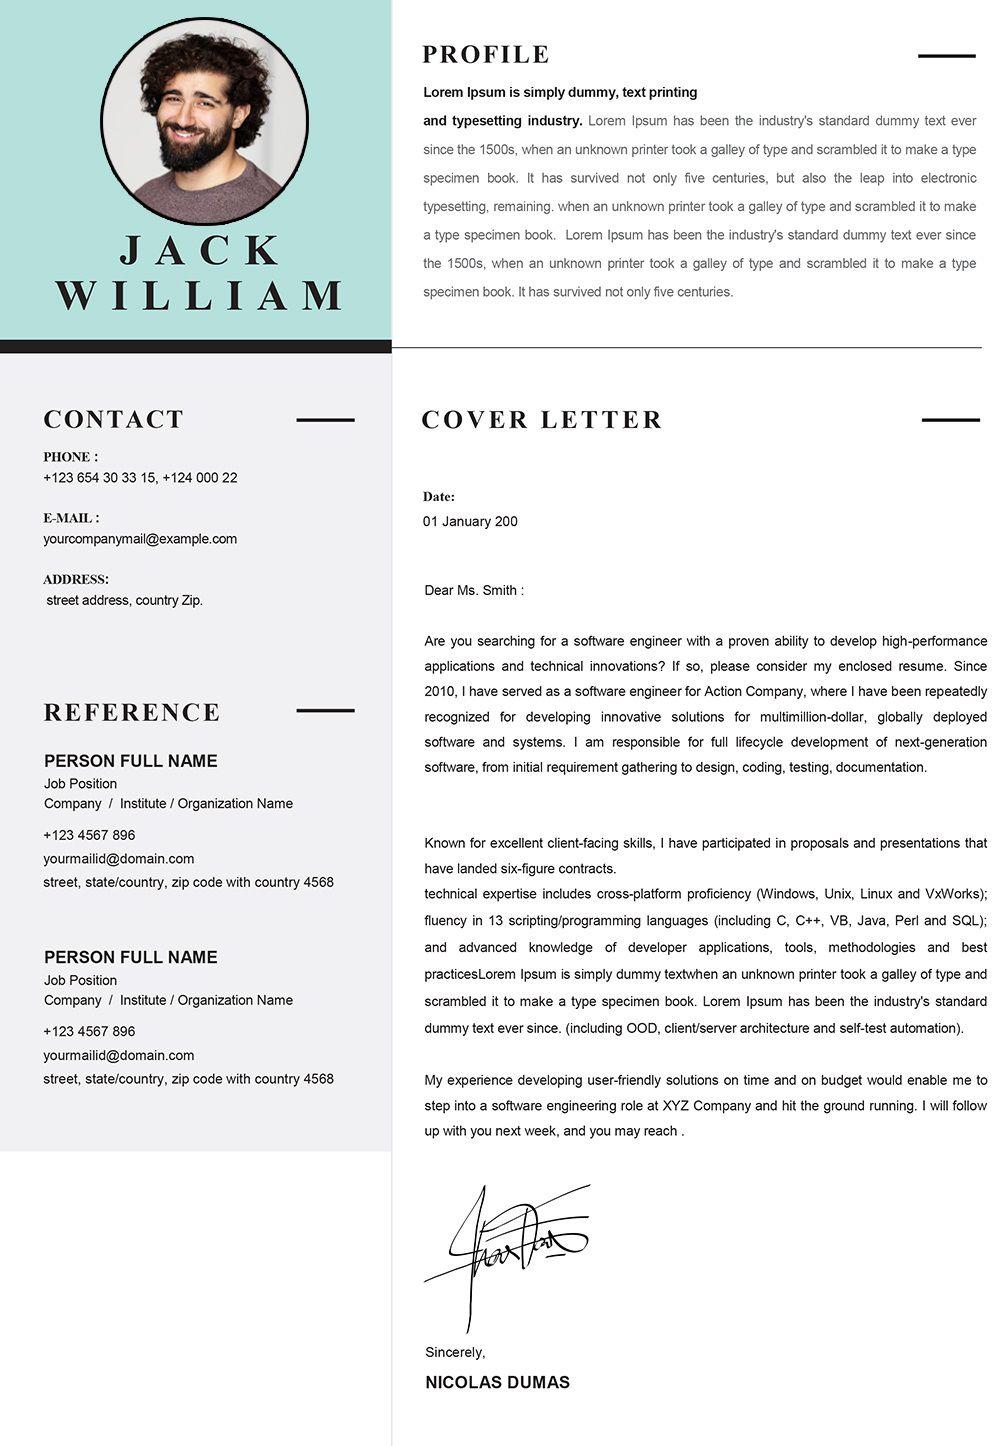 005 Marvelou Microsoft Cover Letter Template 2020 Idea Full